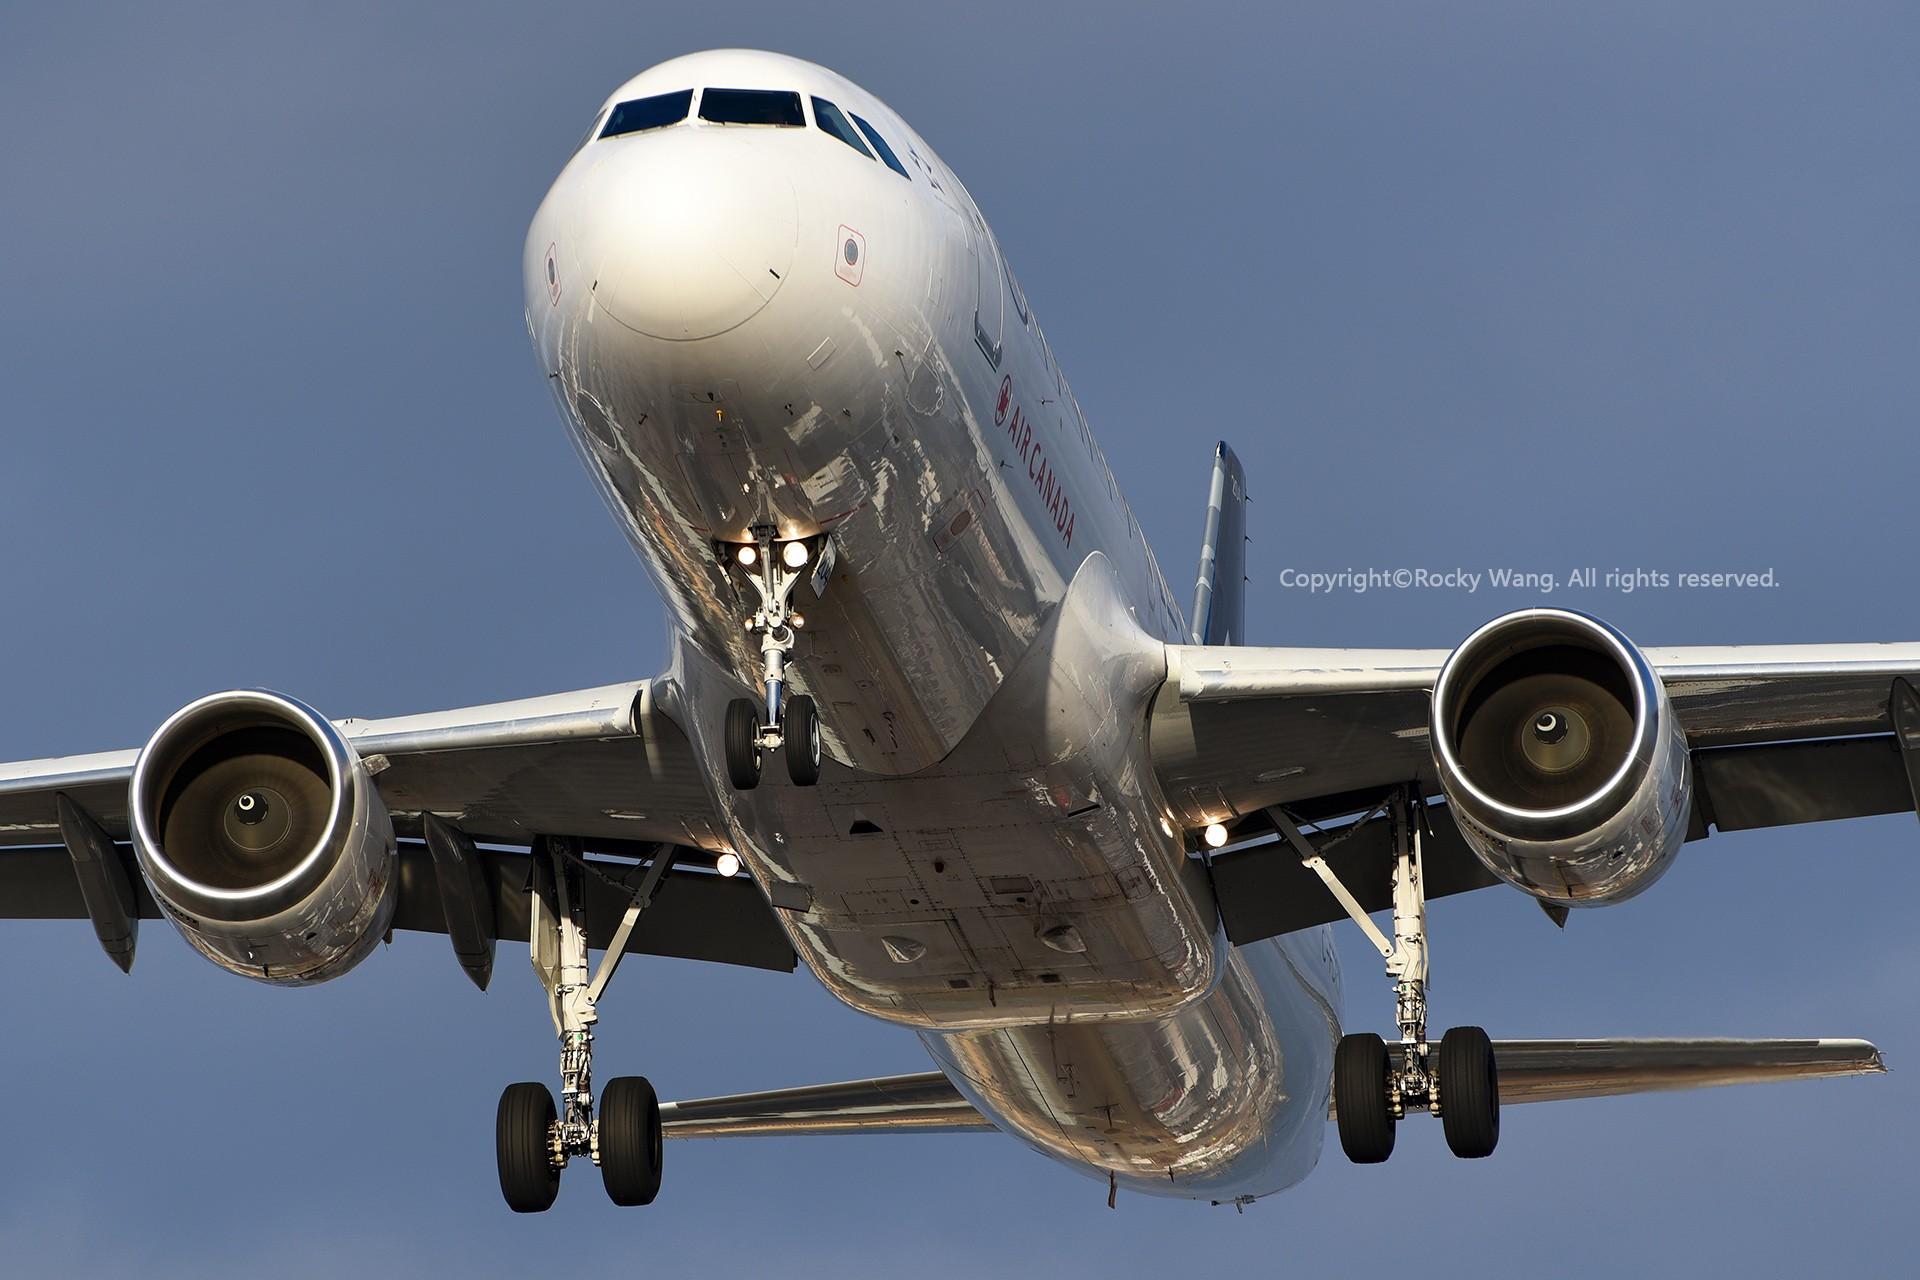 Re:[原创]CYYZ 30图 AIRBUS A320-211 C-FDRK Toronto Lester B. Pearson Int'l Airport